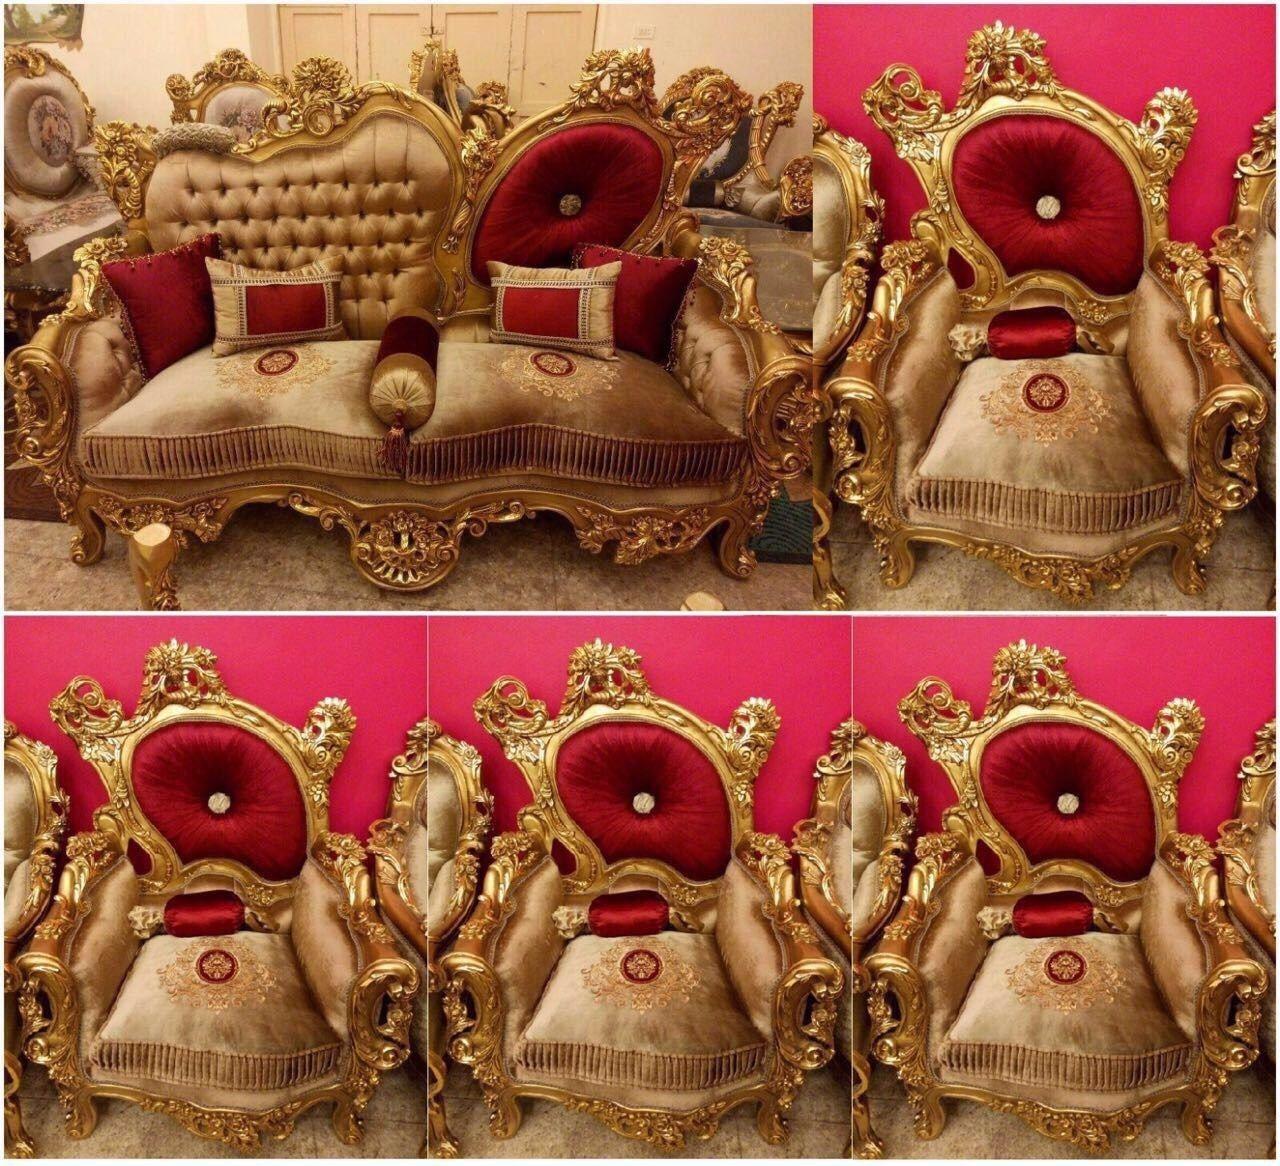 Pin By Drmona On Luxury Sofa Antique Chairs Luxury Sofa Victorian Fashion